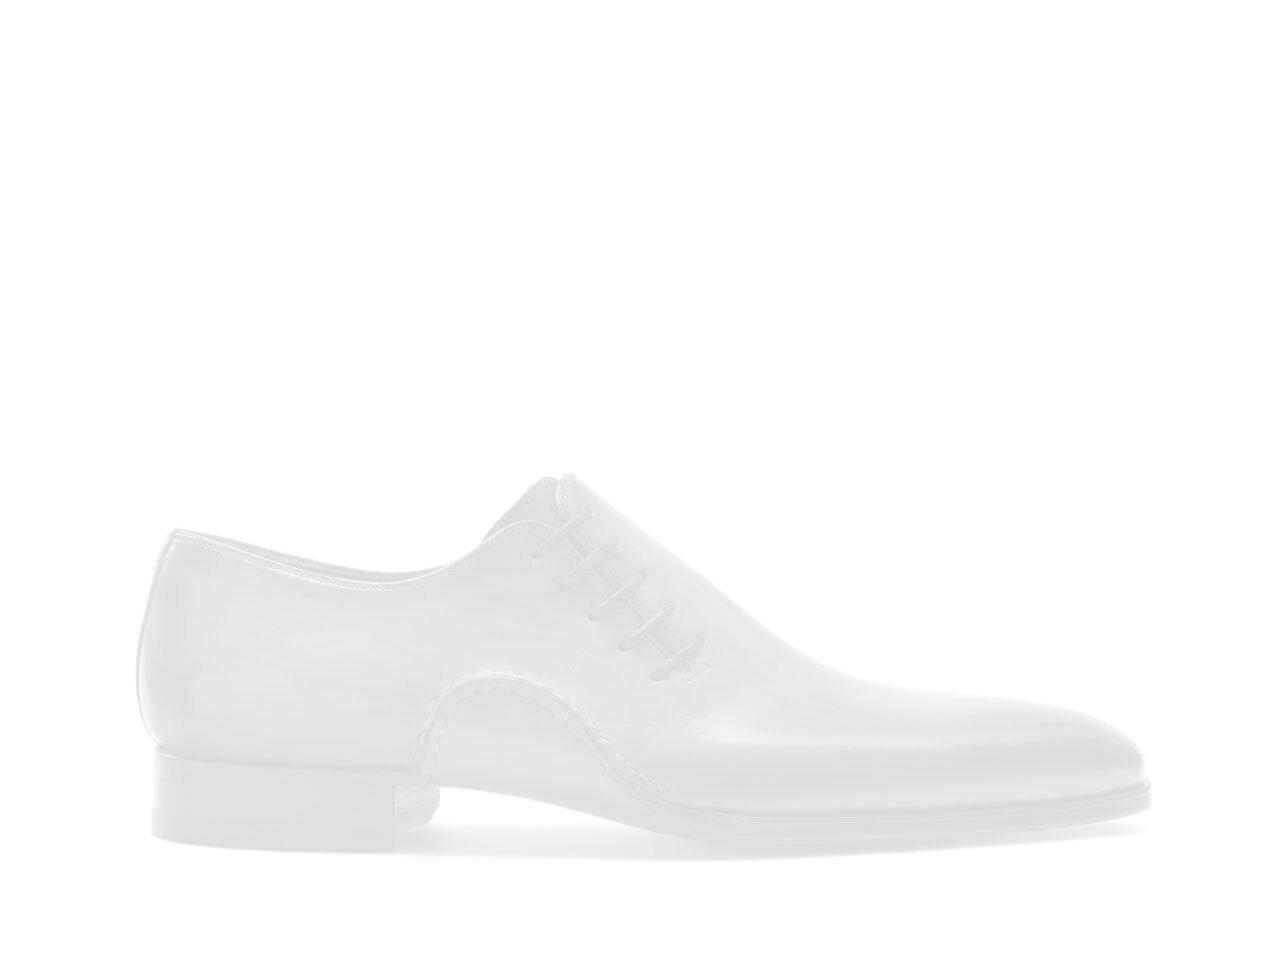 Pair of the Magnanni Borja Brown Men's Double Monk Strap Shoes